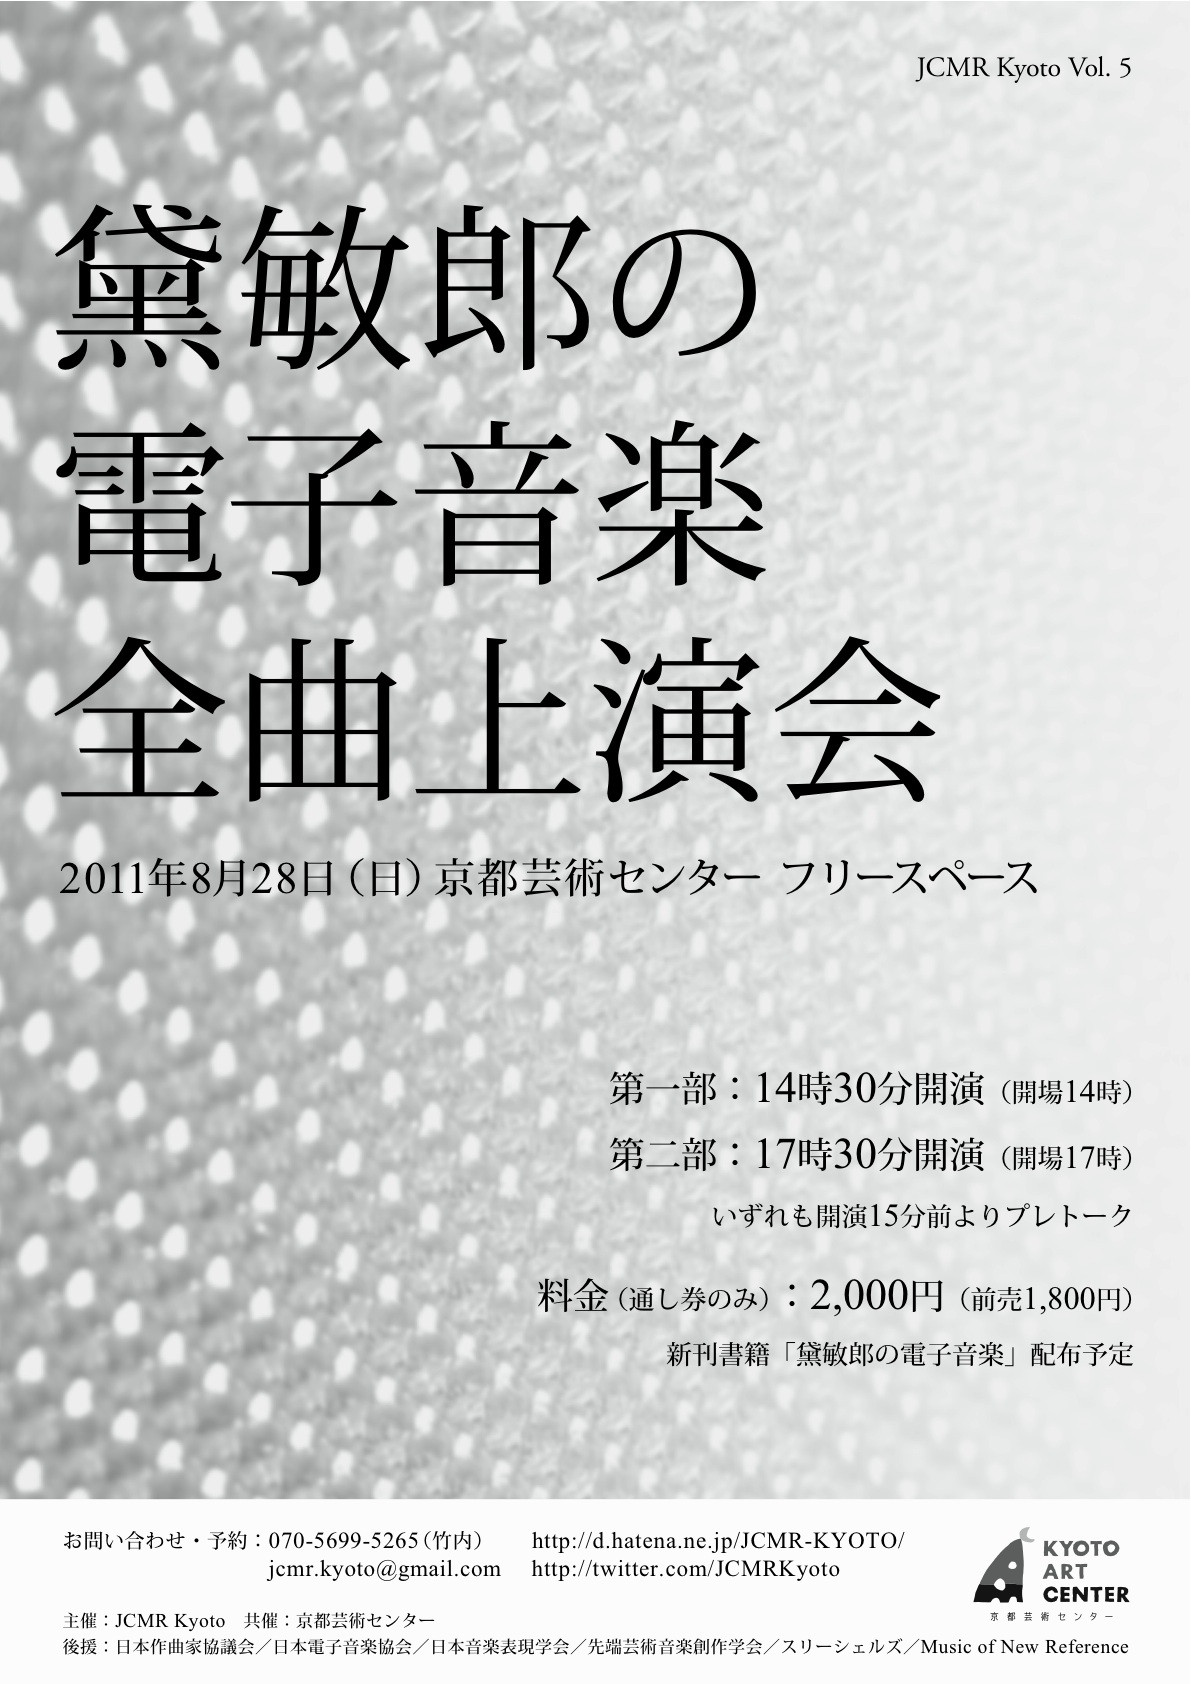 f:id:JCMR-KYOTO:20110709233350j:image